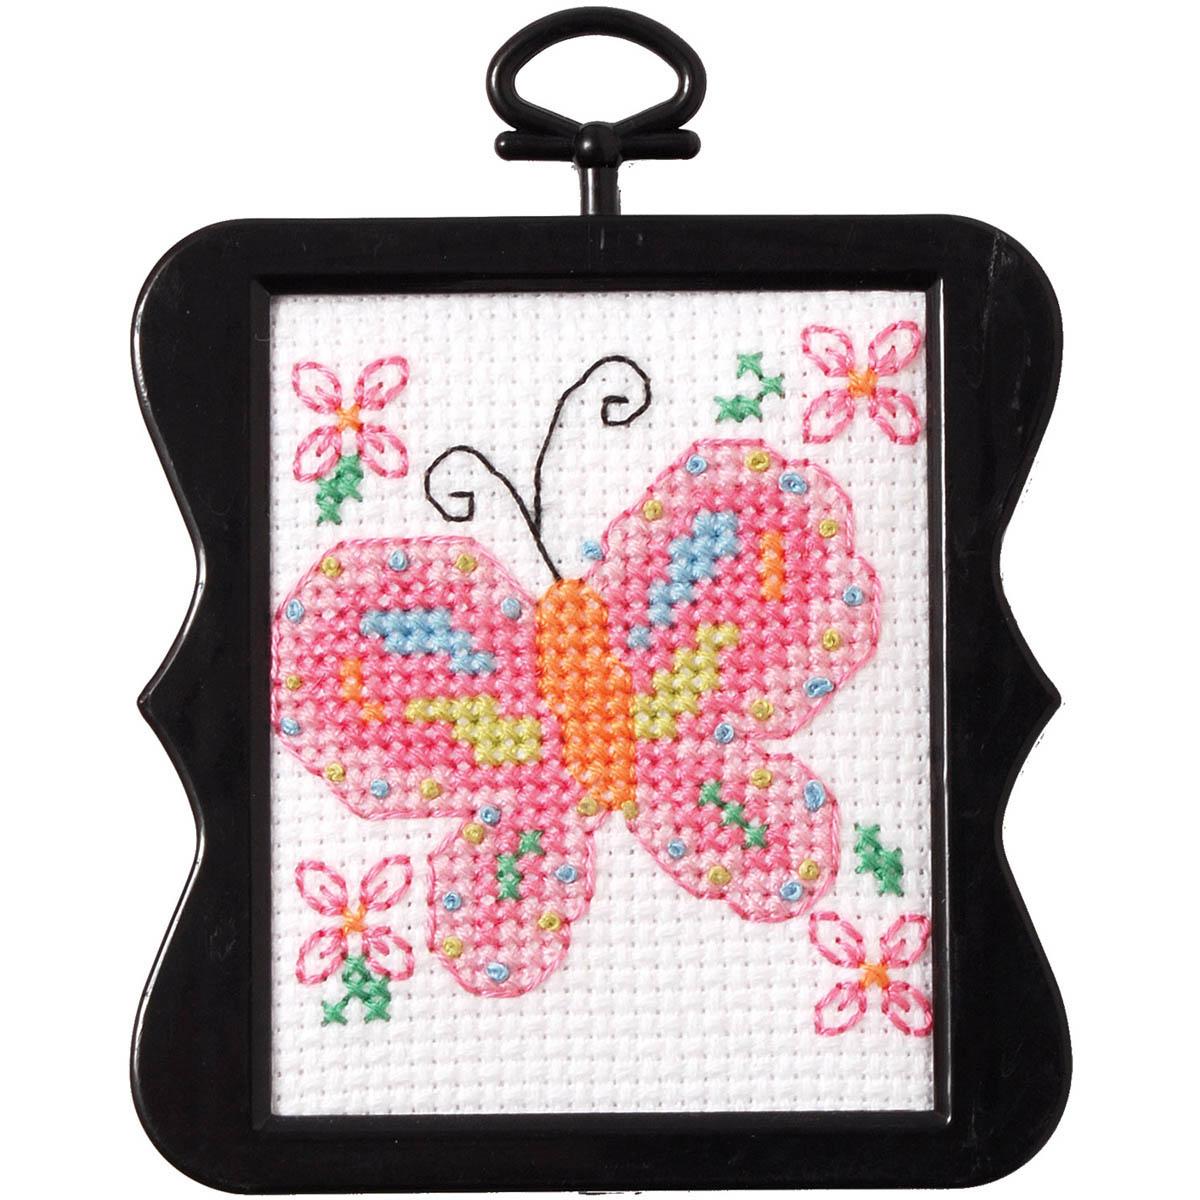 Bucilla ® Counted Cross Stitch - Beginner Stitchery - Mini - Butterfly